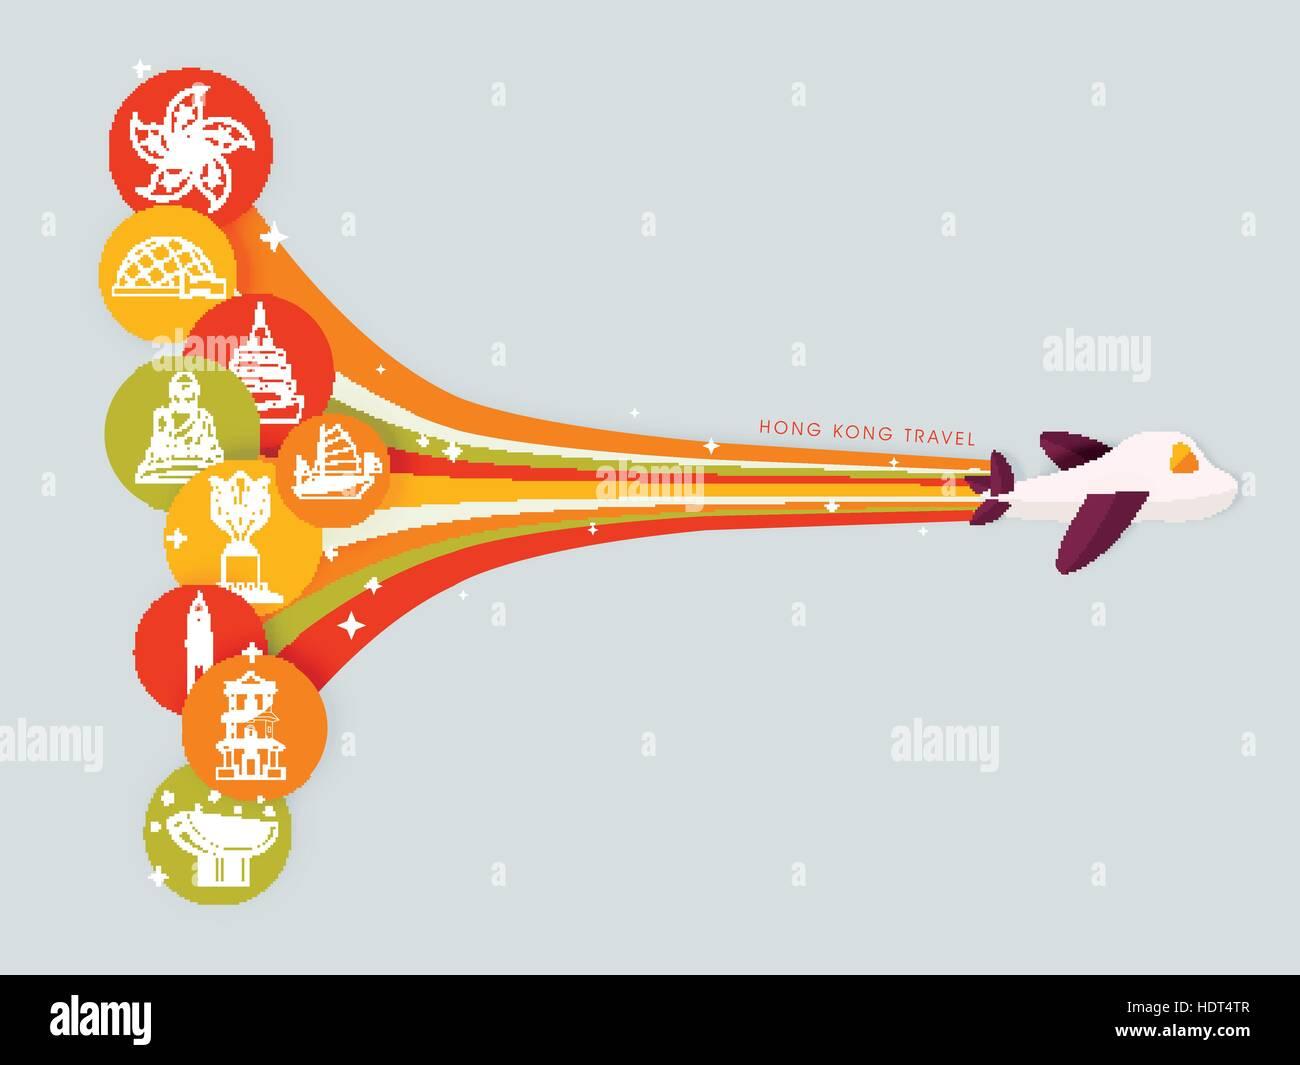 Poster design hong kong - Stock Vector Attractive Hong Kong Travel Poster Design In Flat Design